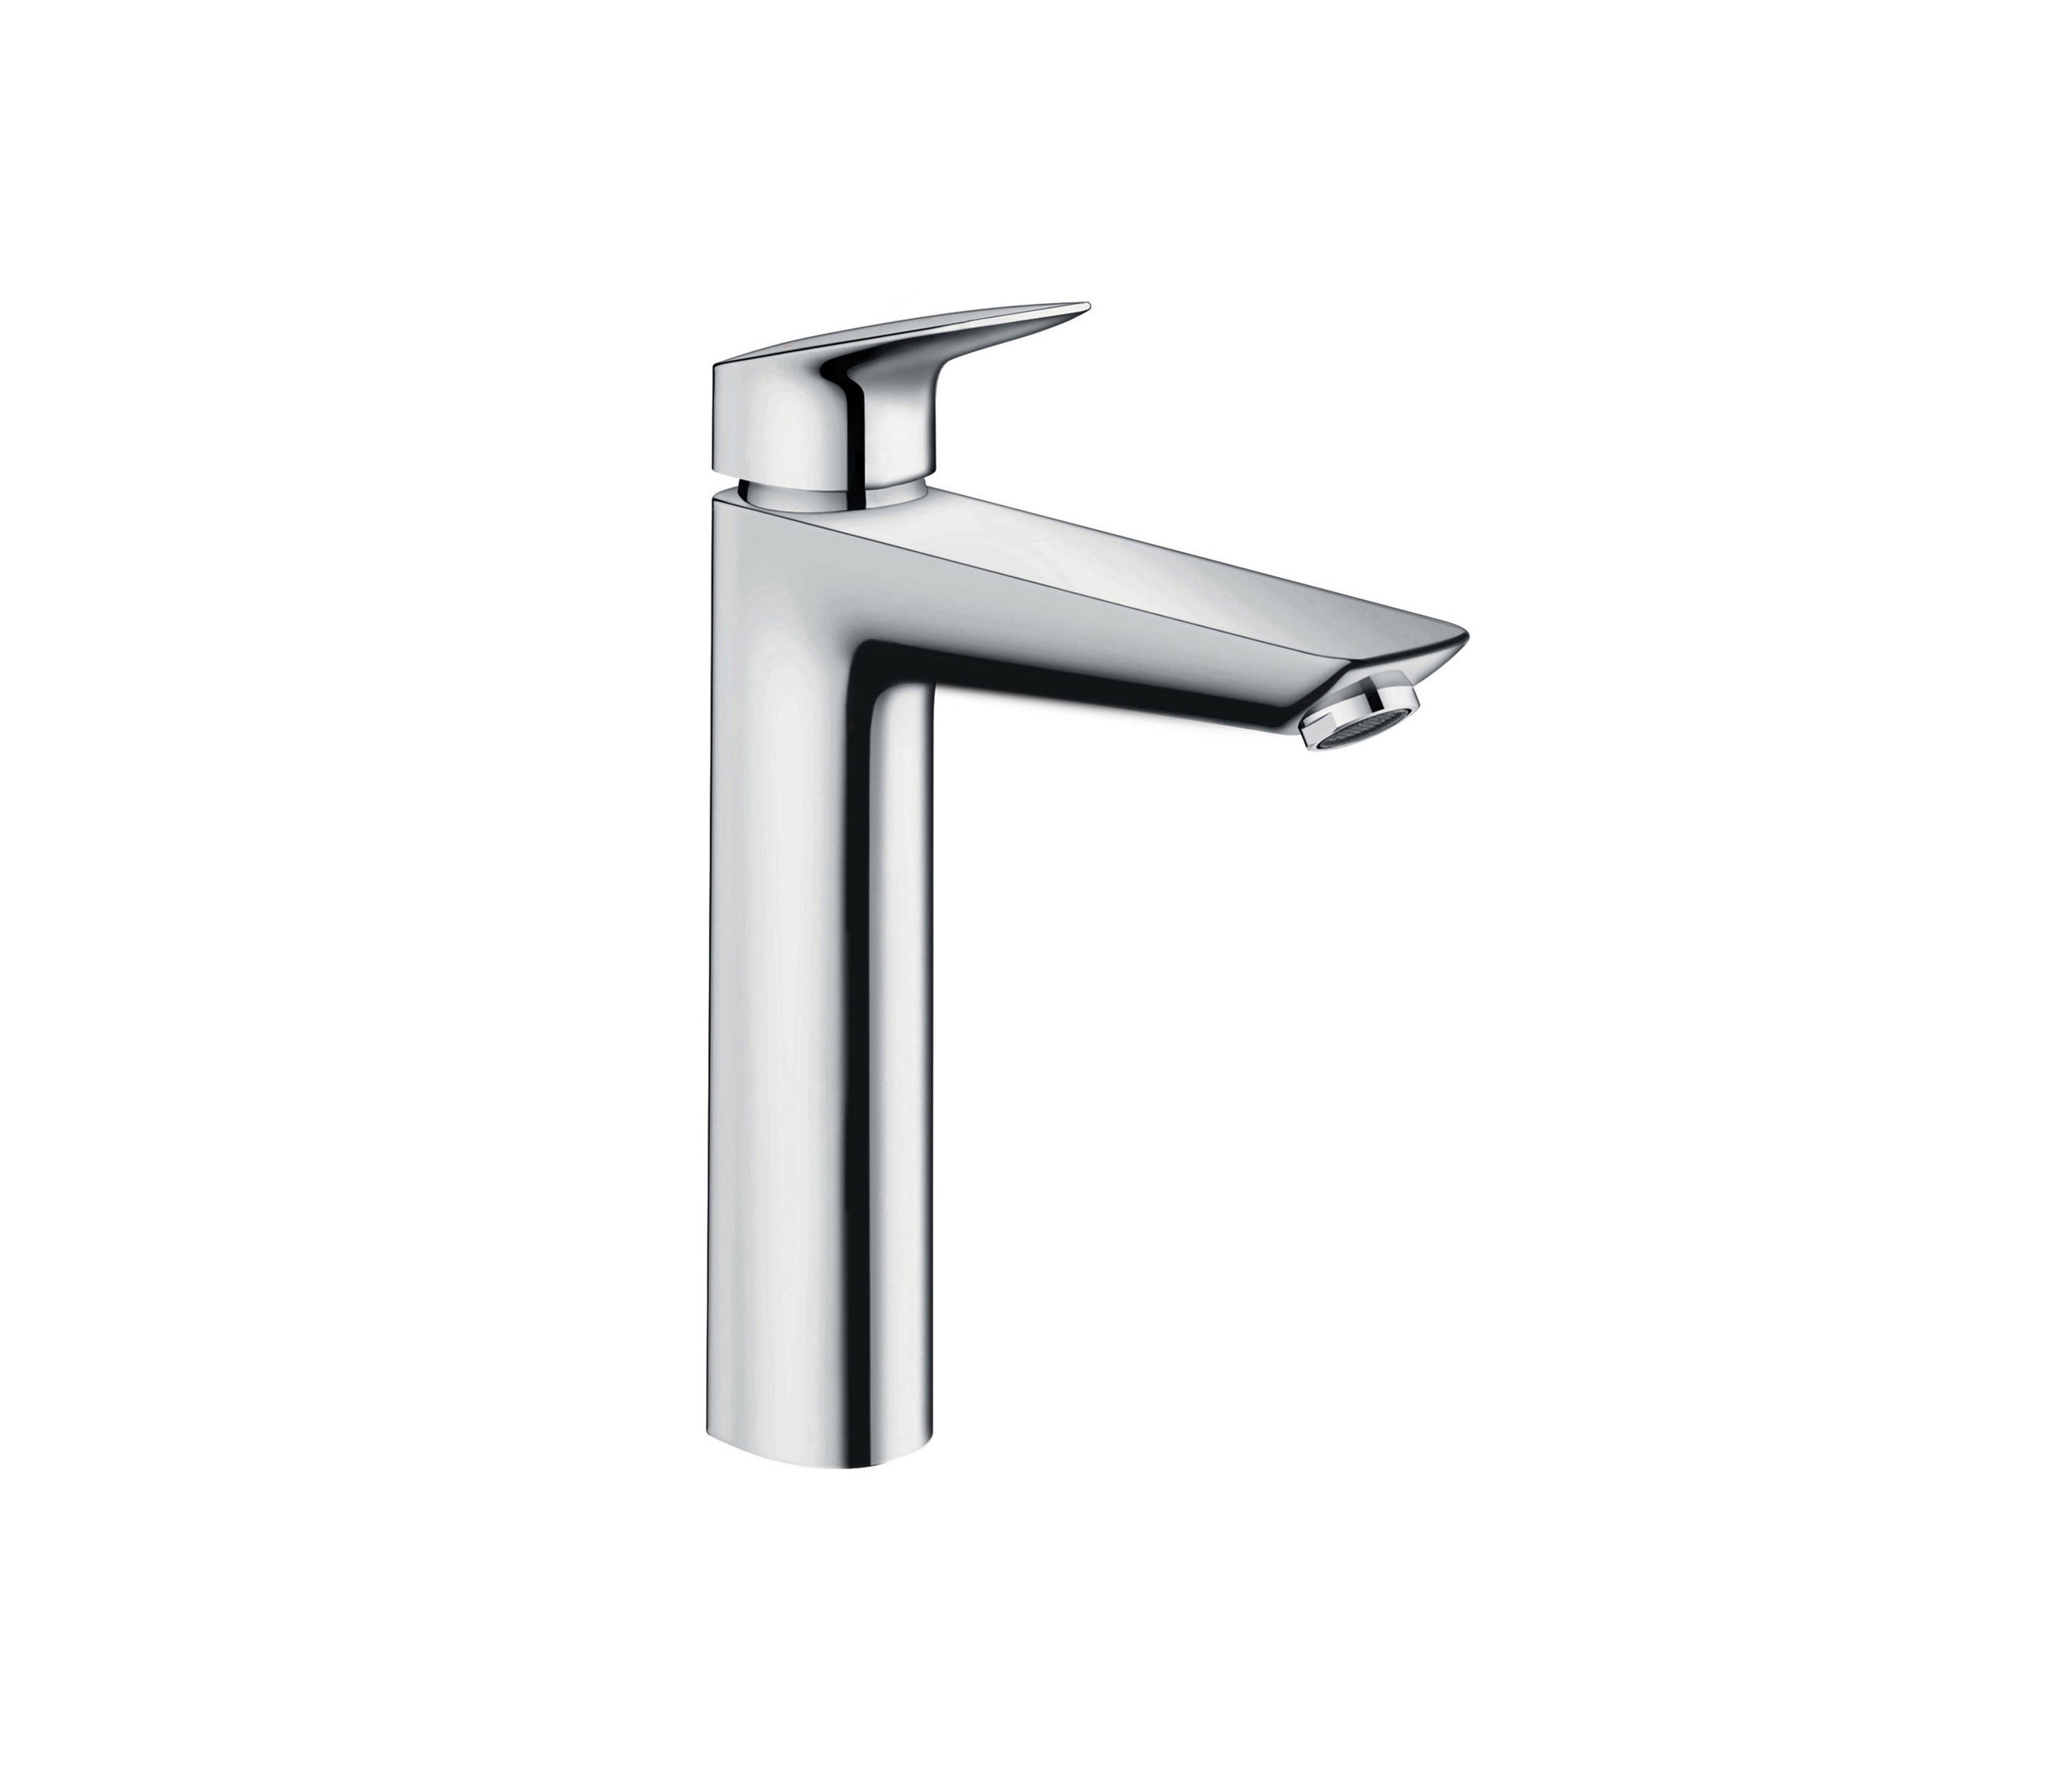 hansgrohe logis 190 mitigeur lavabo robinetterie pour lavabo de hansgrohe architonic. Black Bedroom Furniture Sets. Home Design Ideas